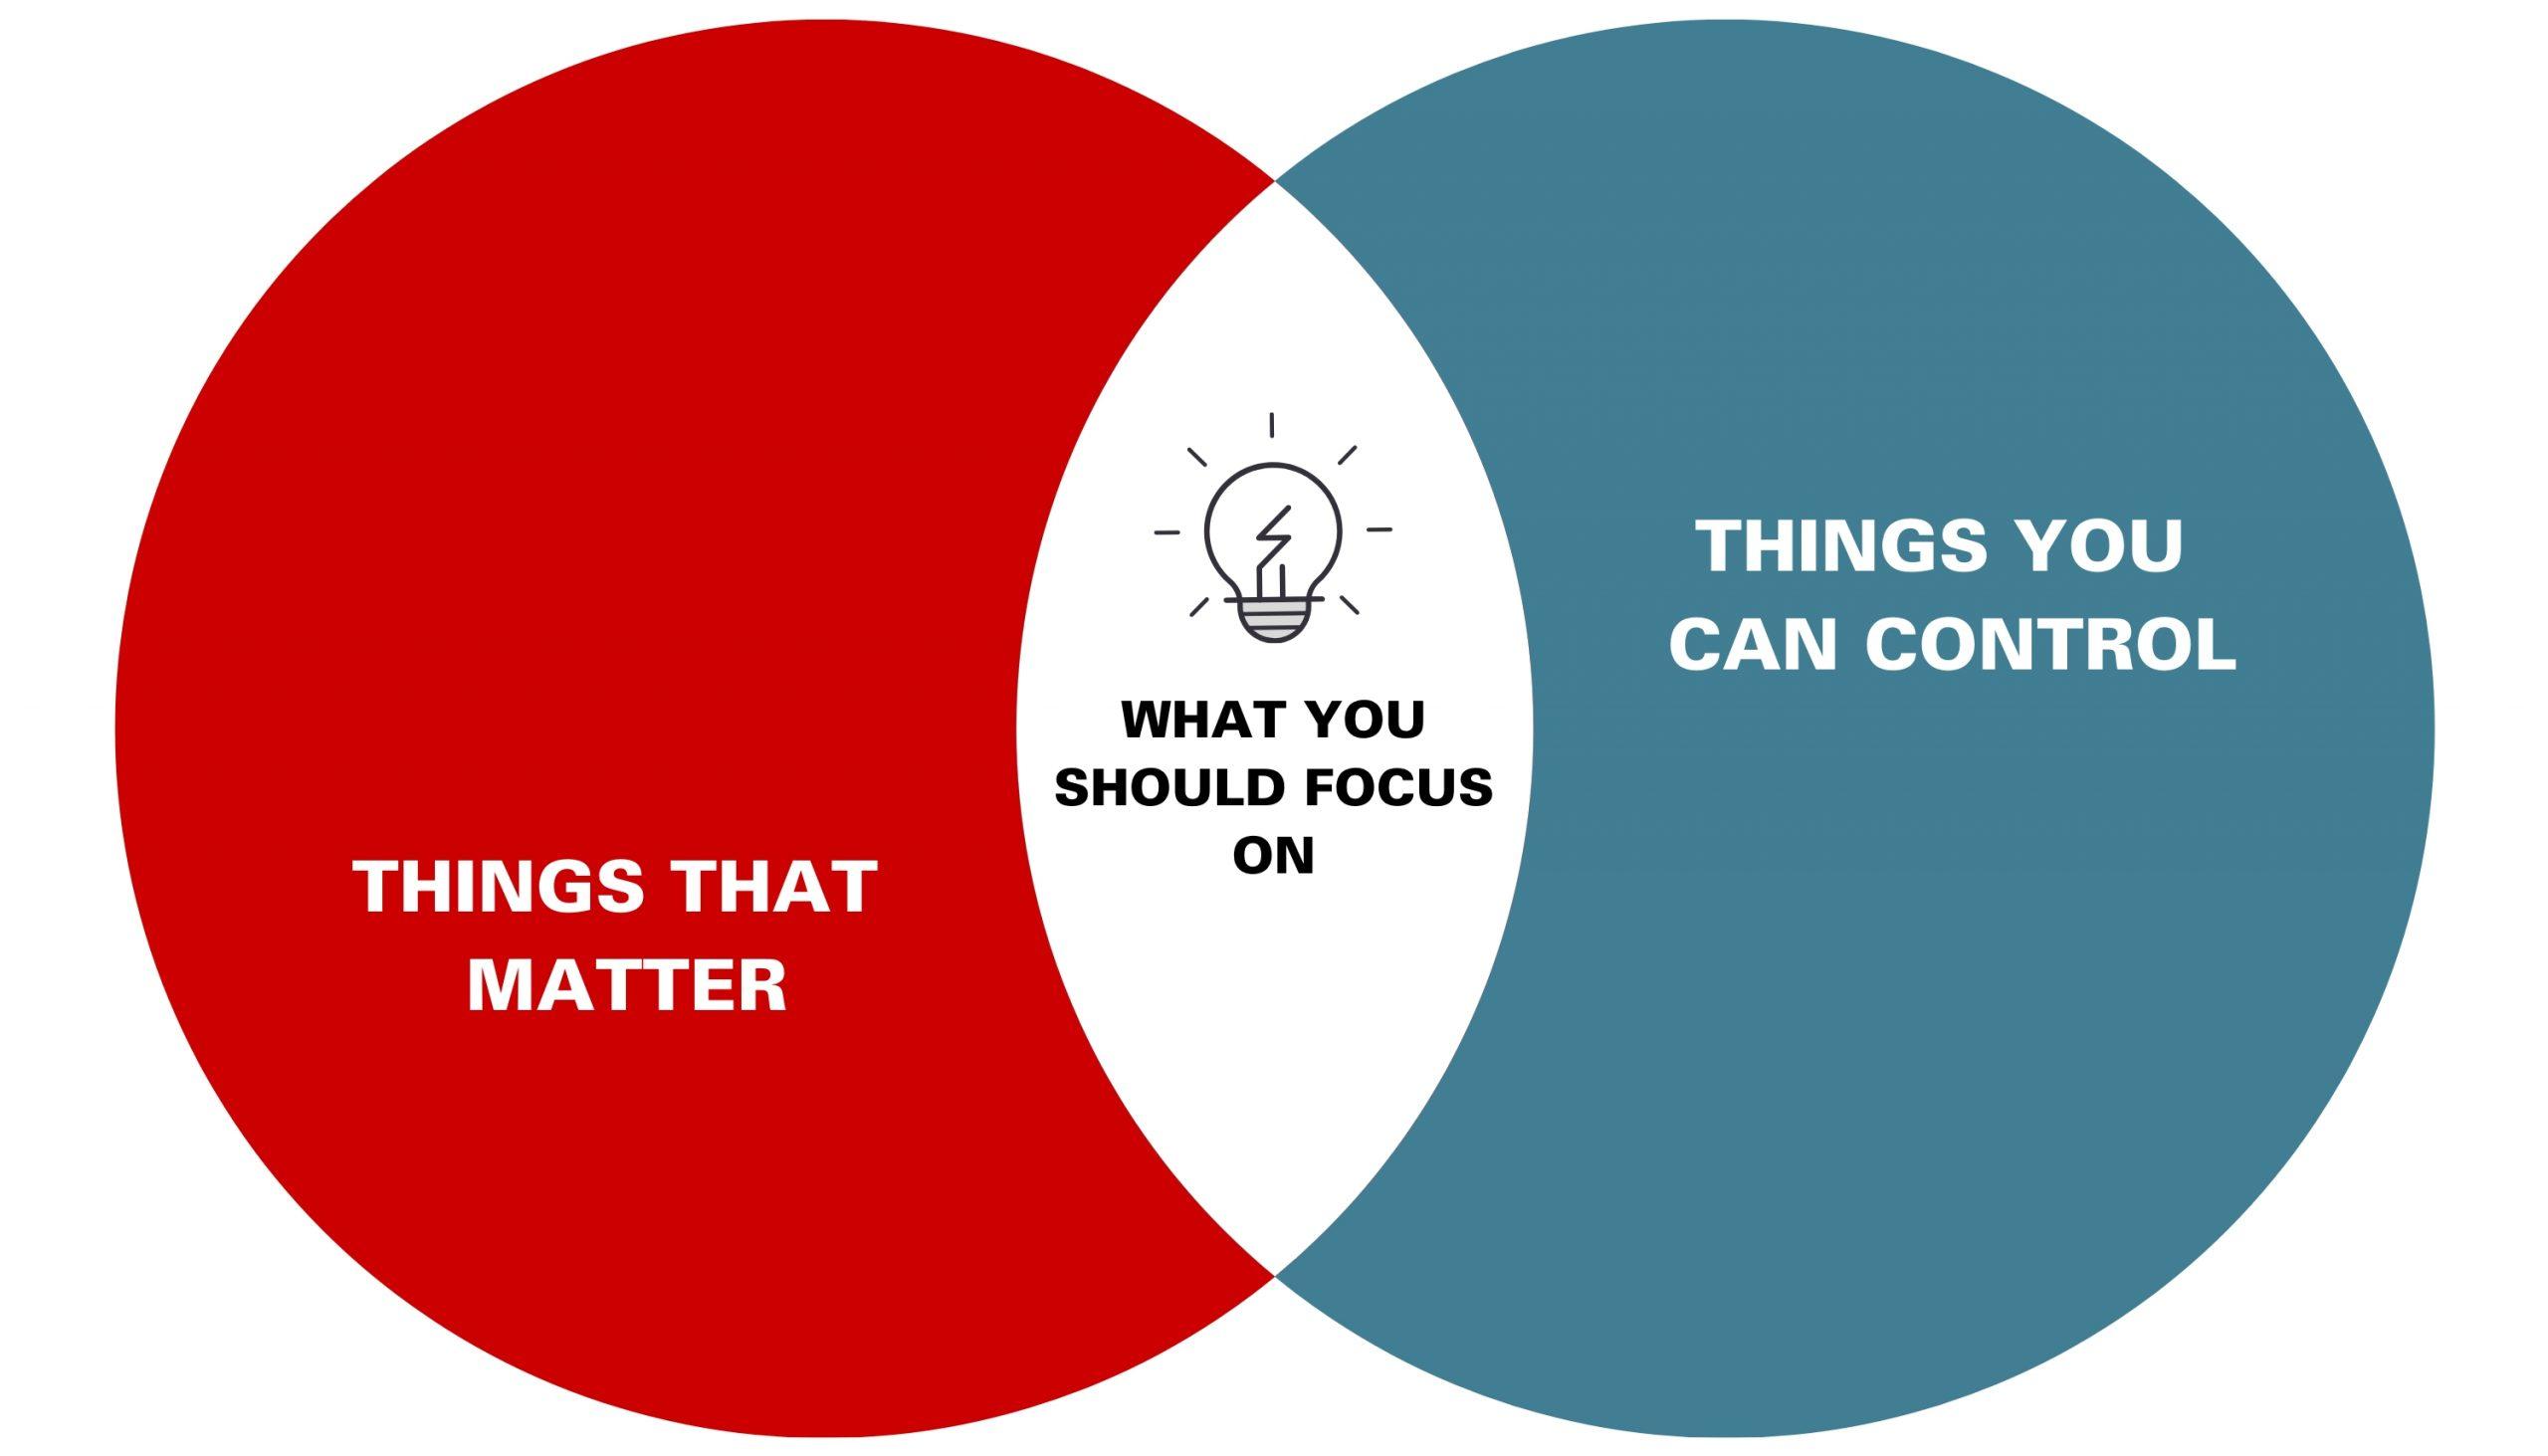 Things that matter vs. Things you can control Venn Diagram